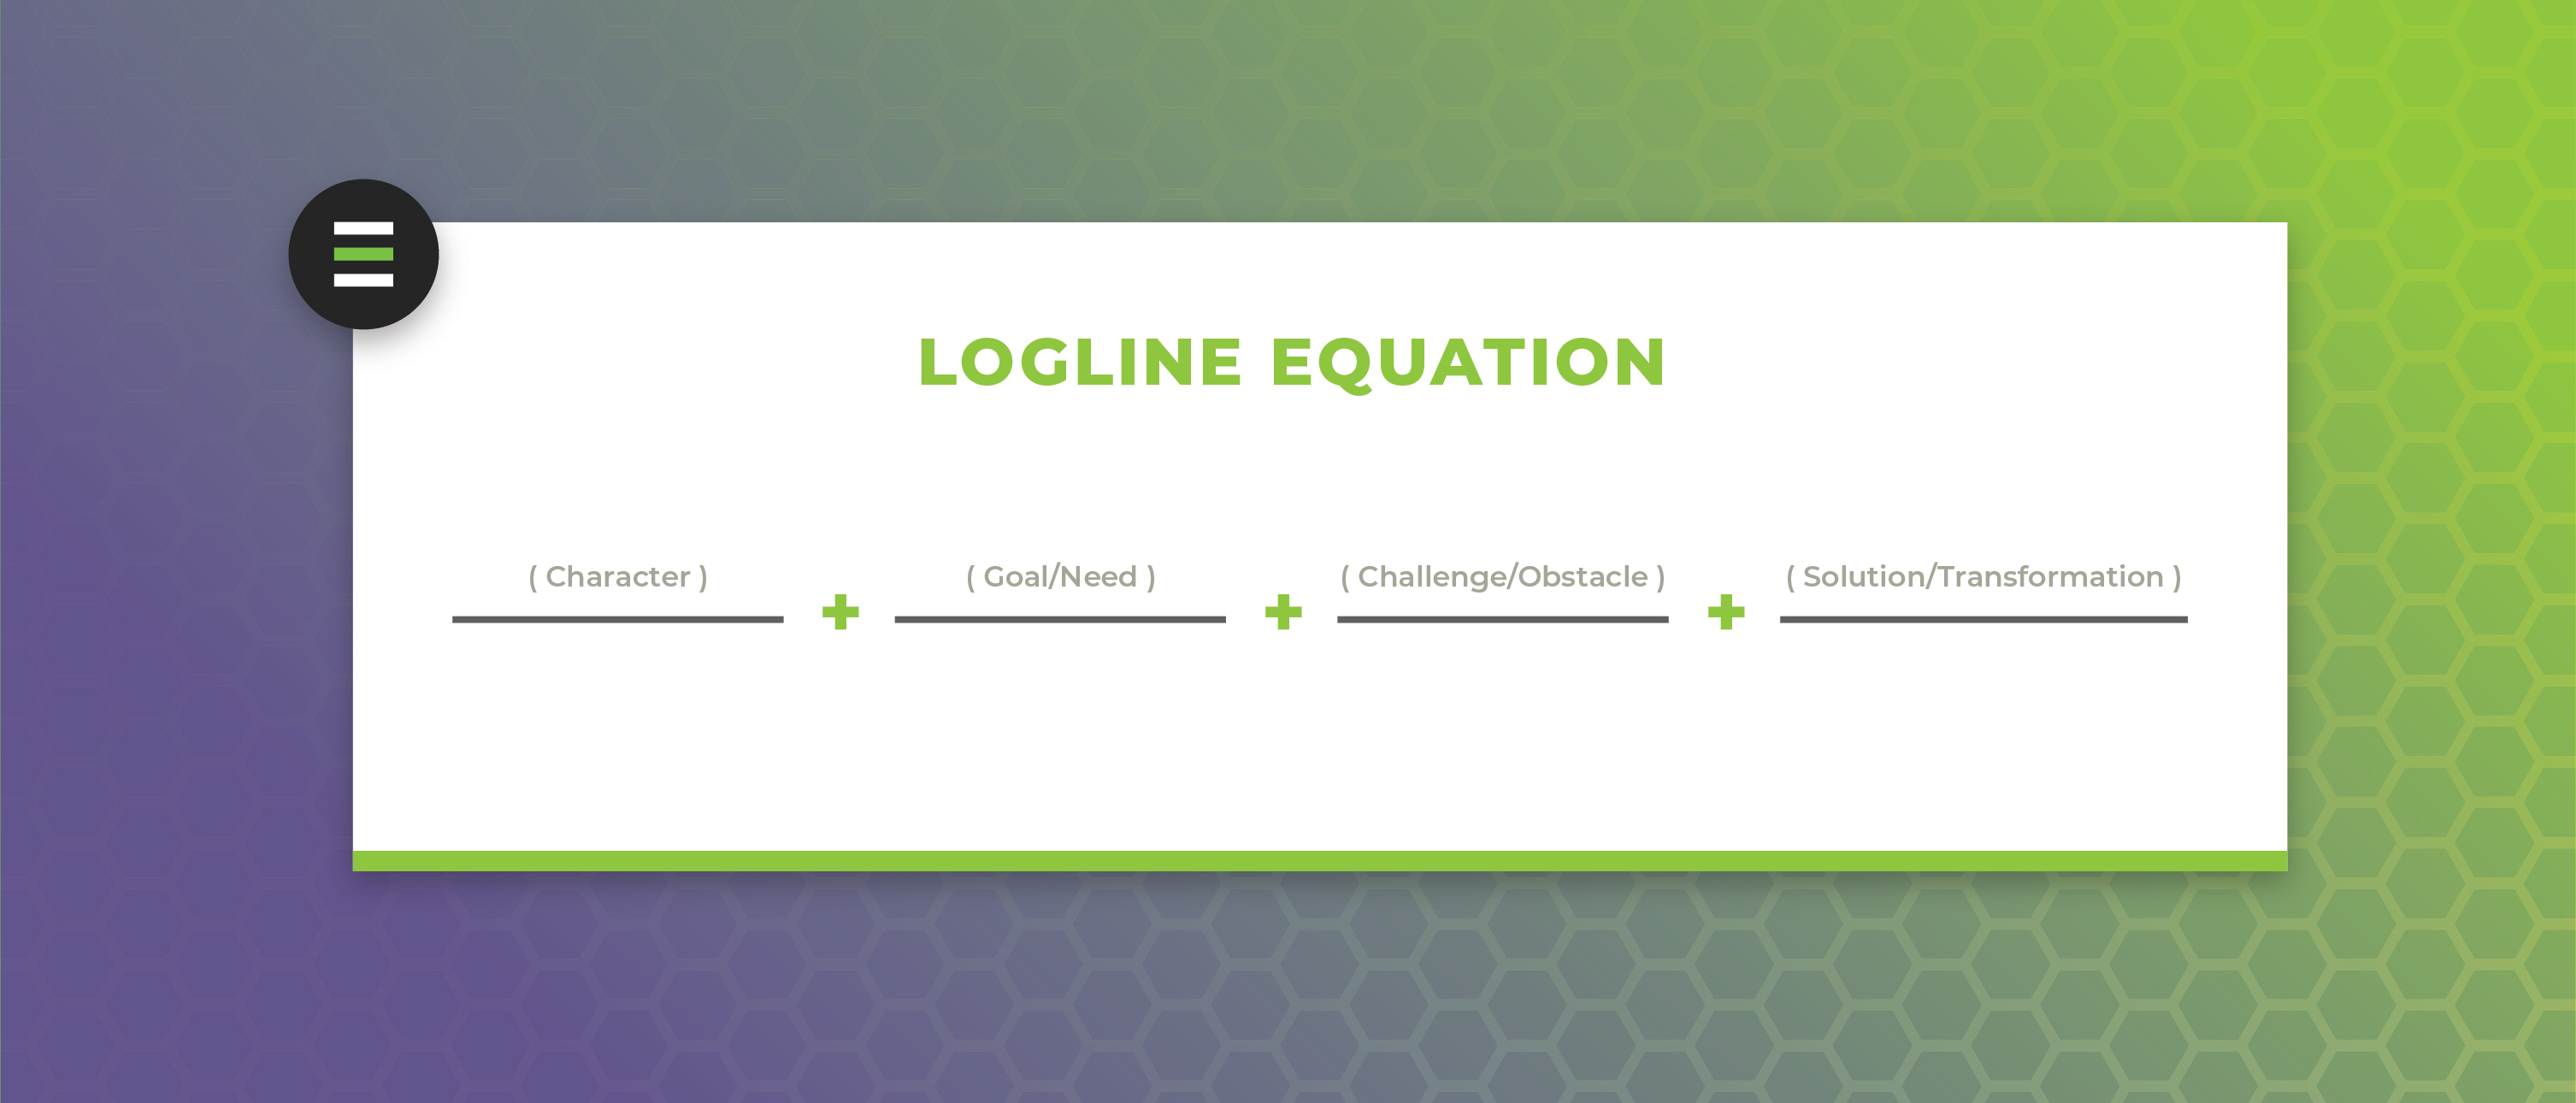 Logline Equation Template